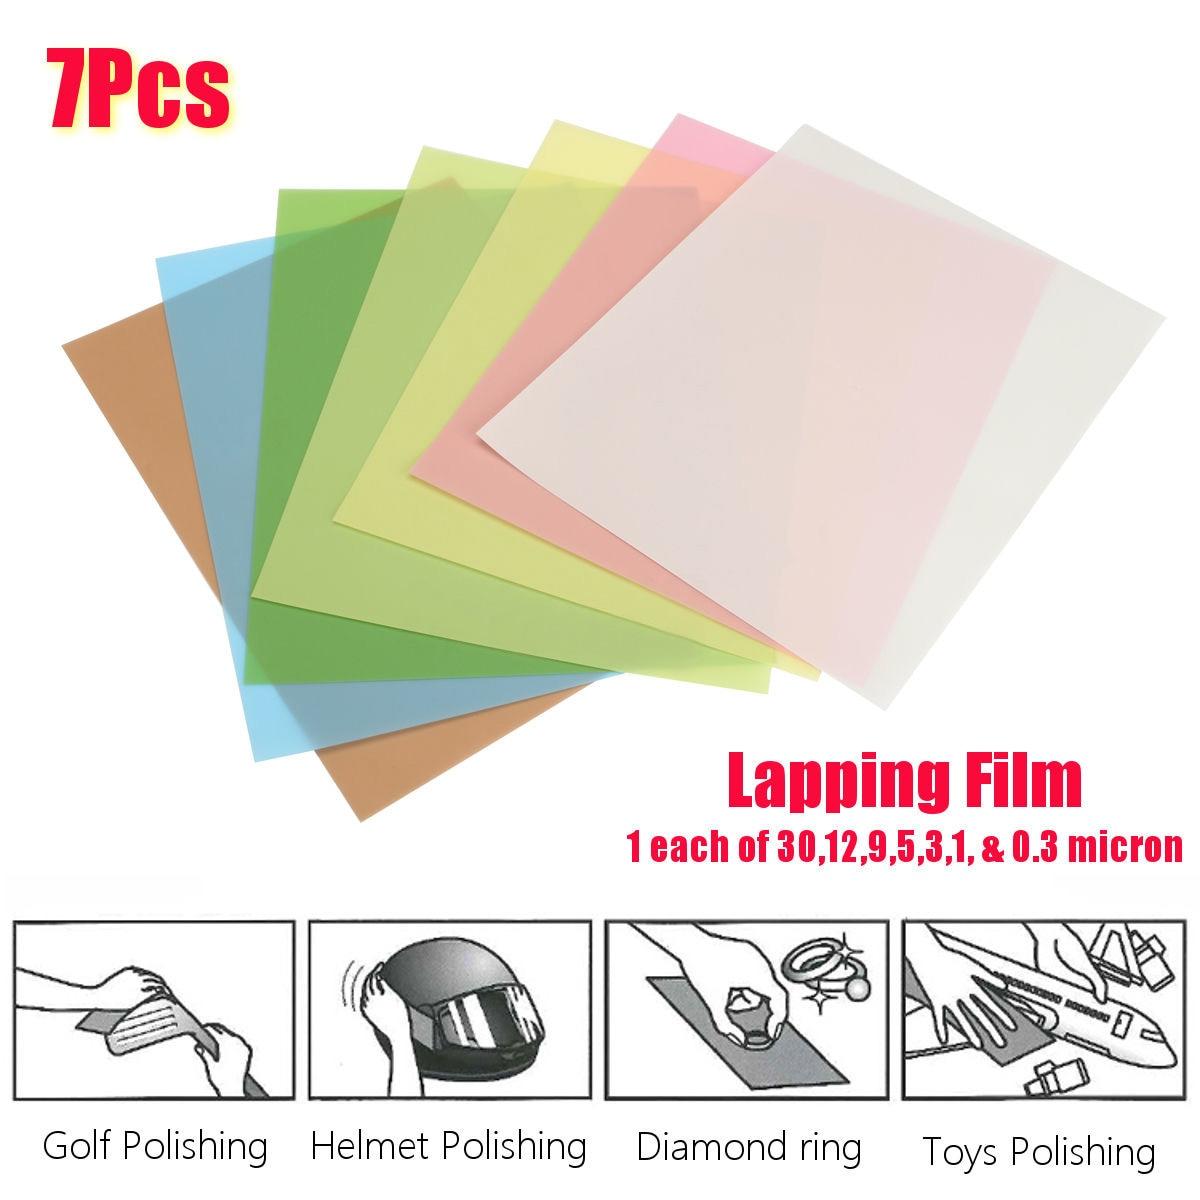 7pcs/set Lapping Film Sheets Assortment Precision For Polishing Sandpaper 1500/2000/4000/6000/8000/10000/12000 Grits New Hot